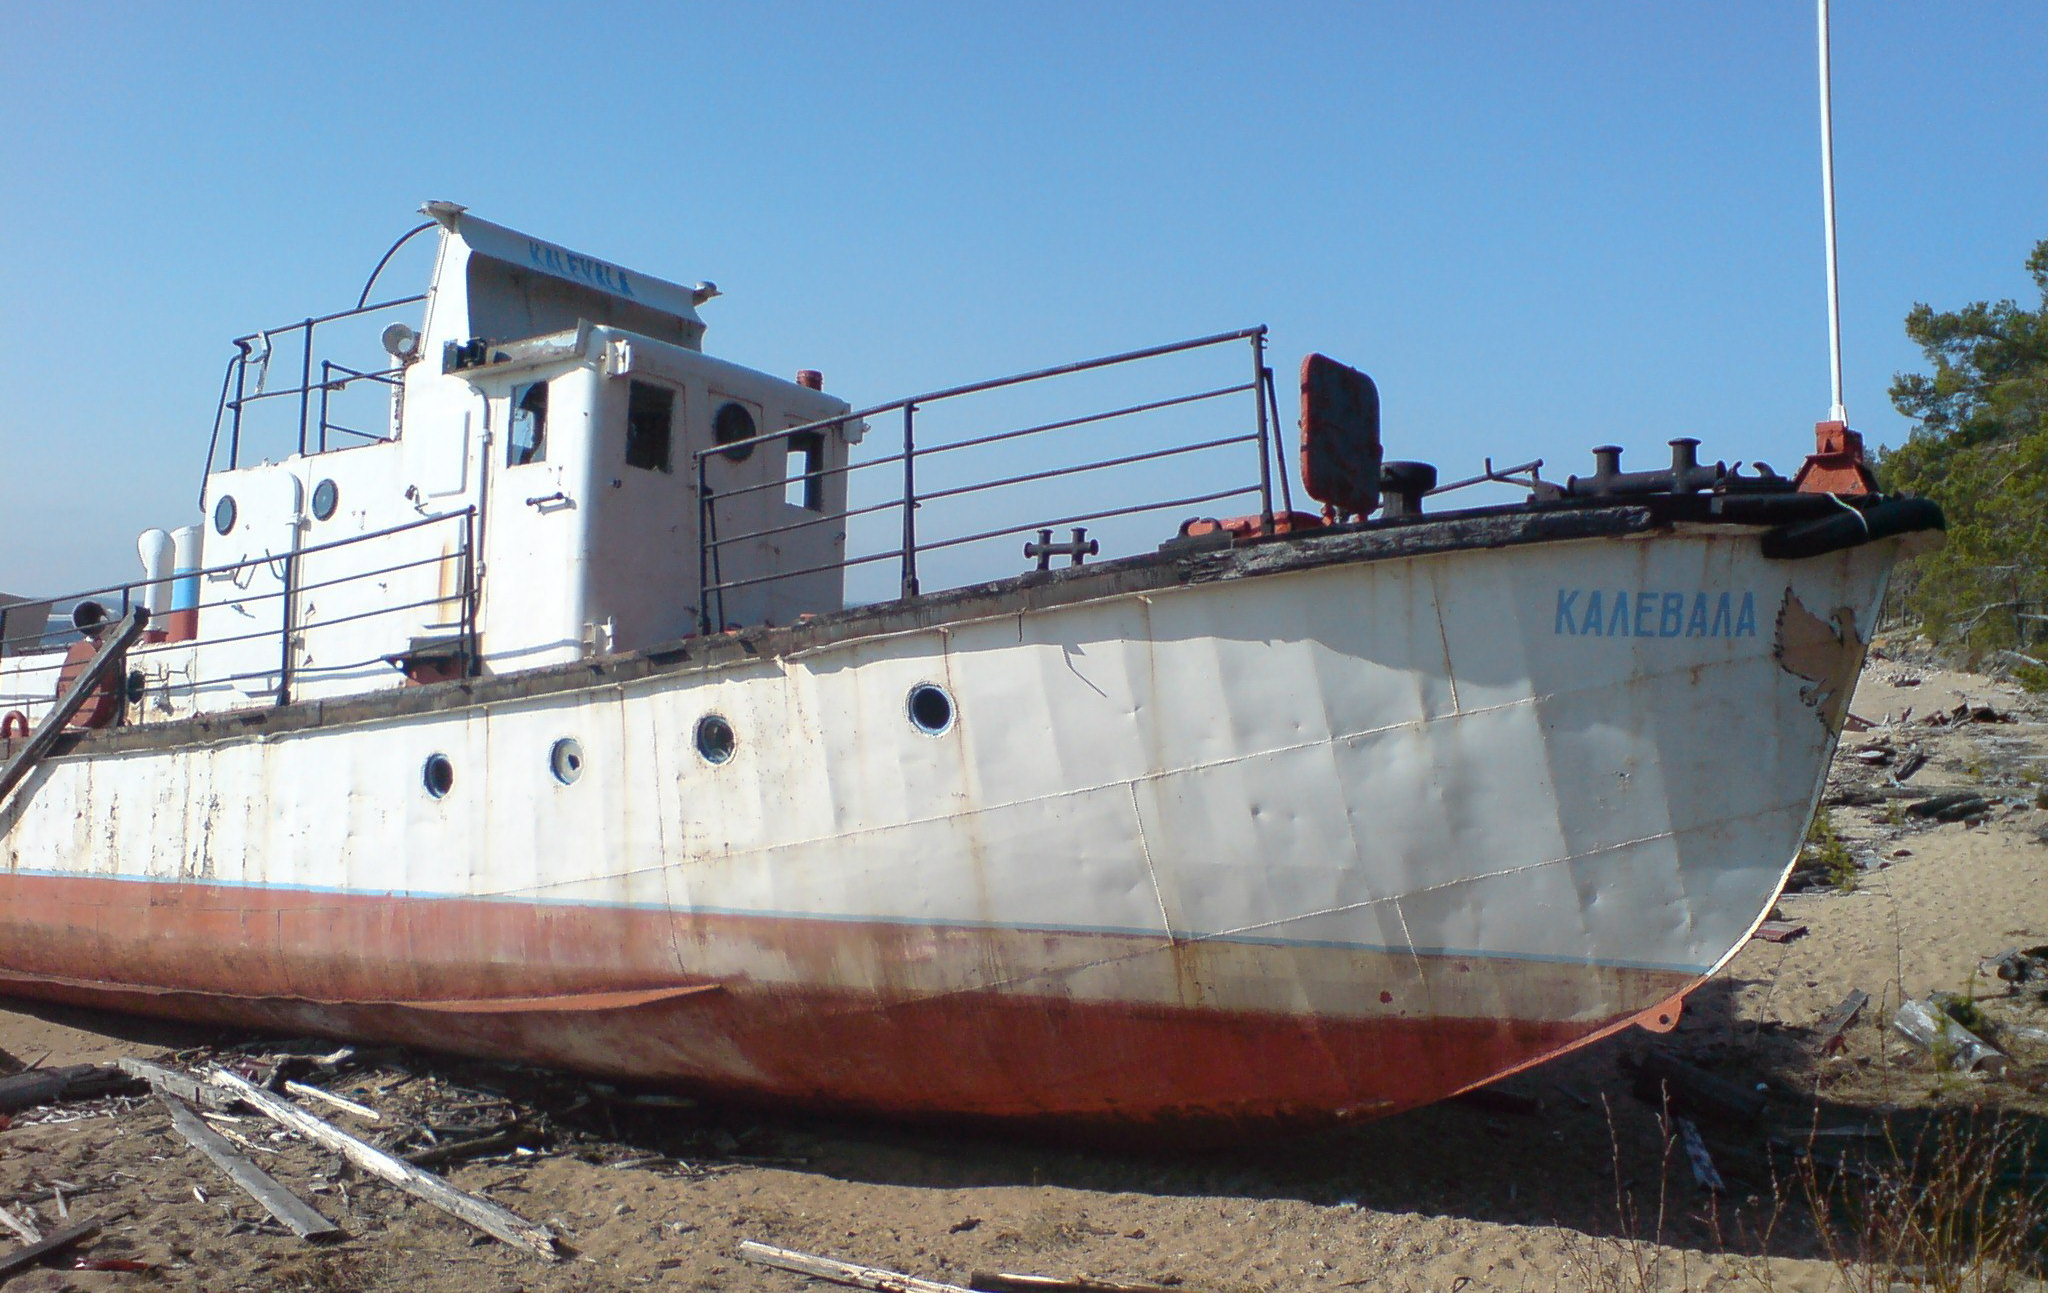 """Калевала"" на корабельном кладбище. Фото: Андрей Туоми"